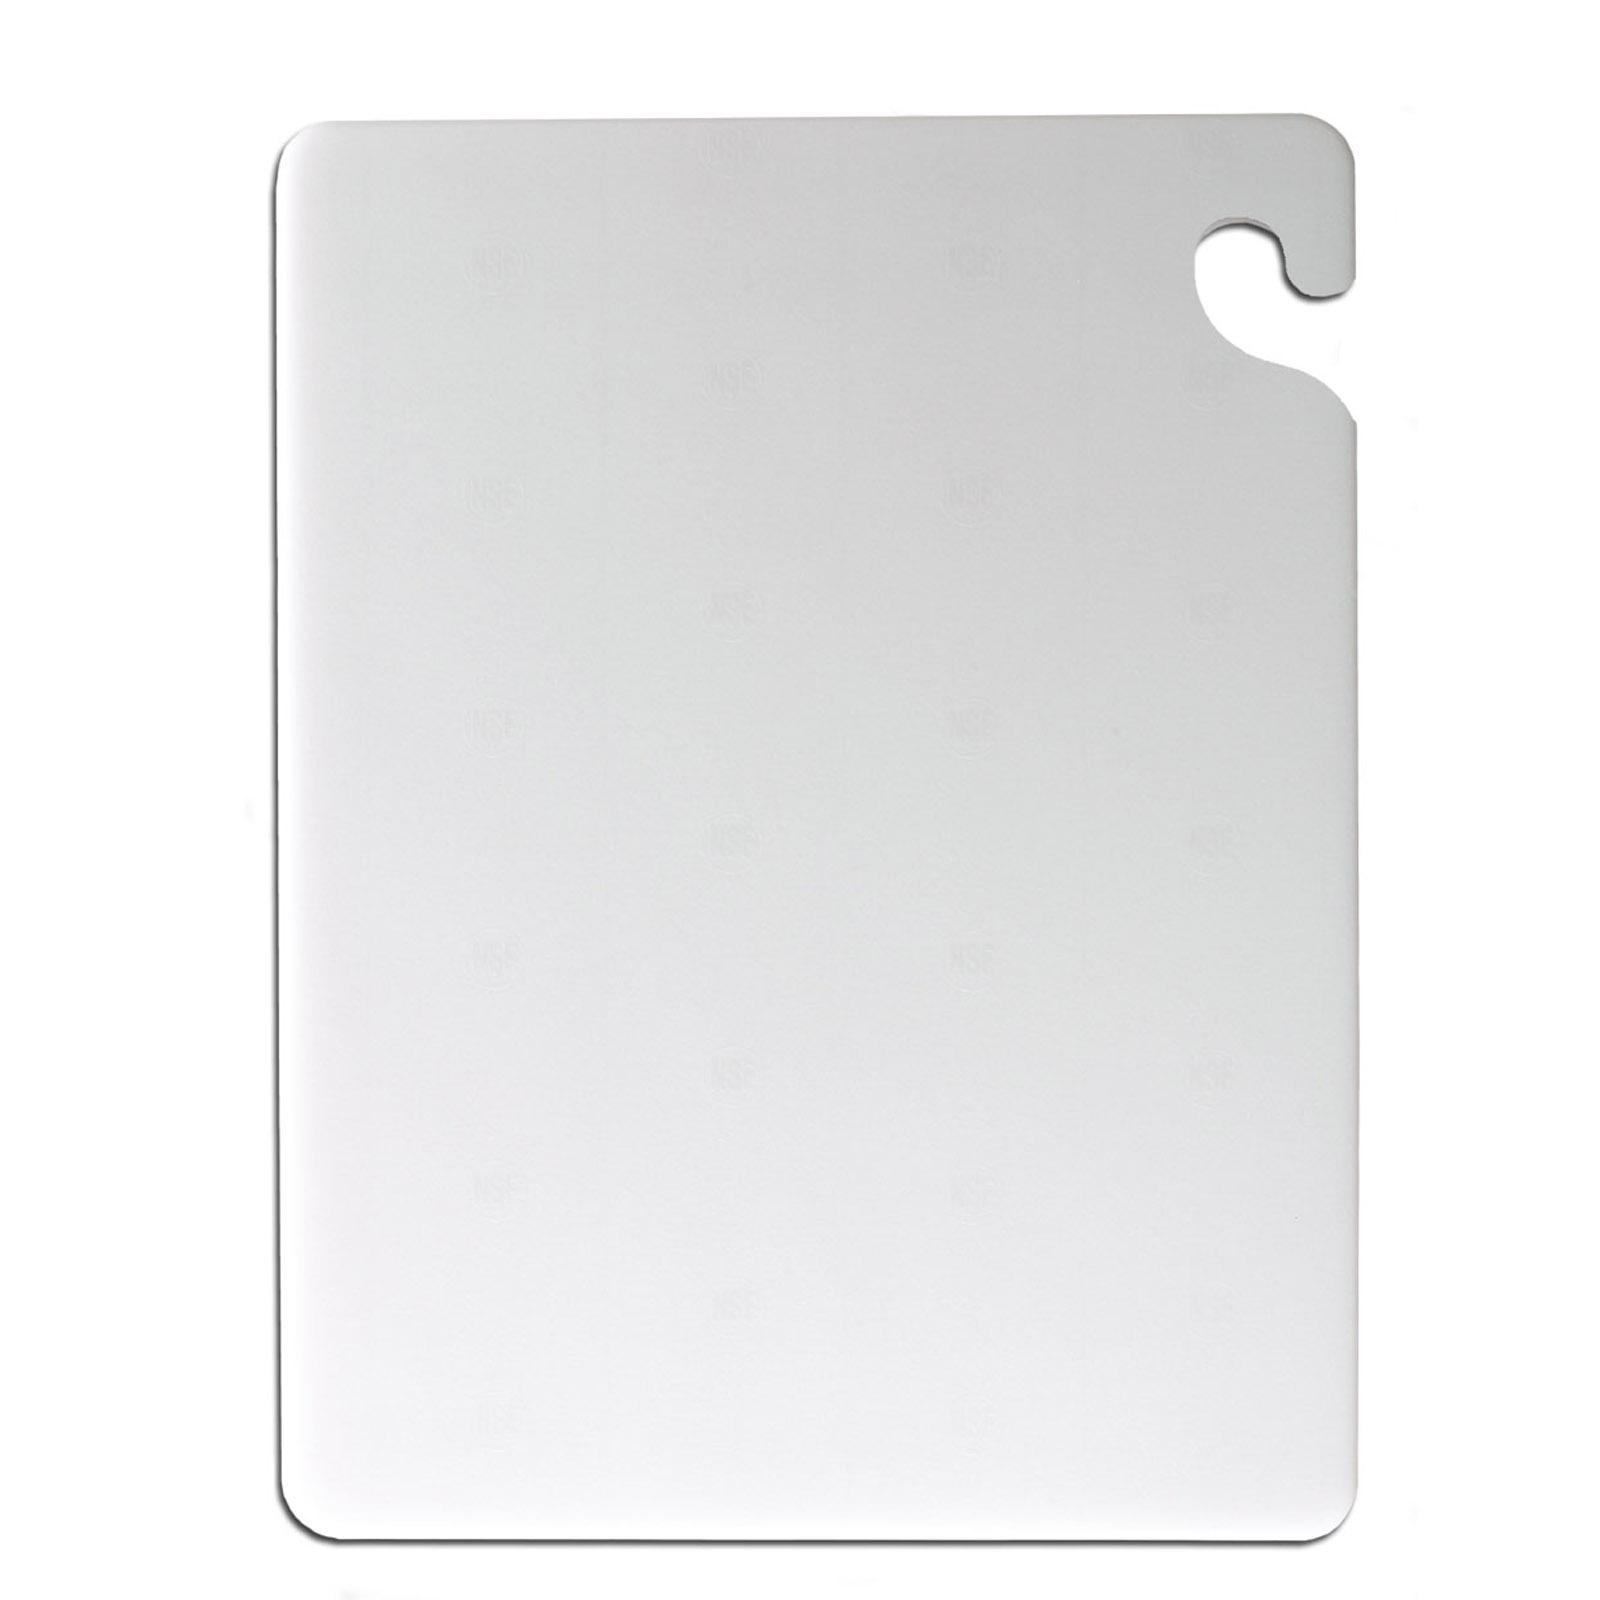 San Jamar CB242412WH cutting board, plastic